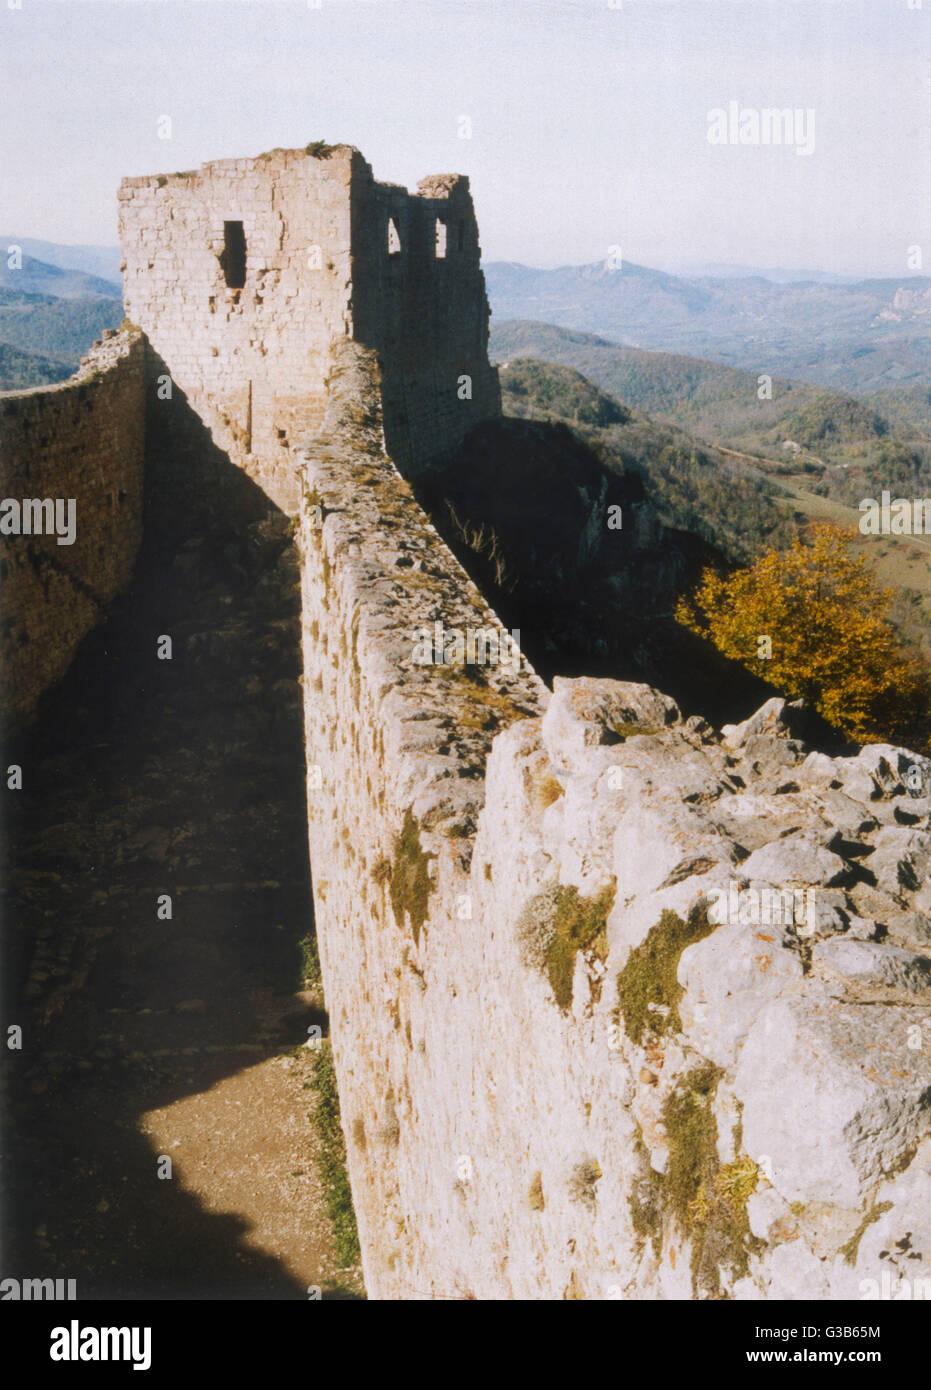 Montsegur, Languedoc         Date: 1989 - Stock Image